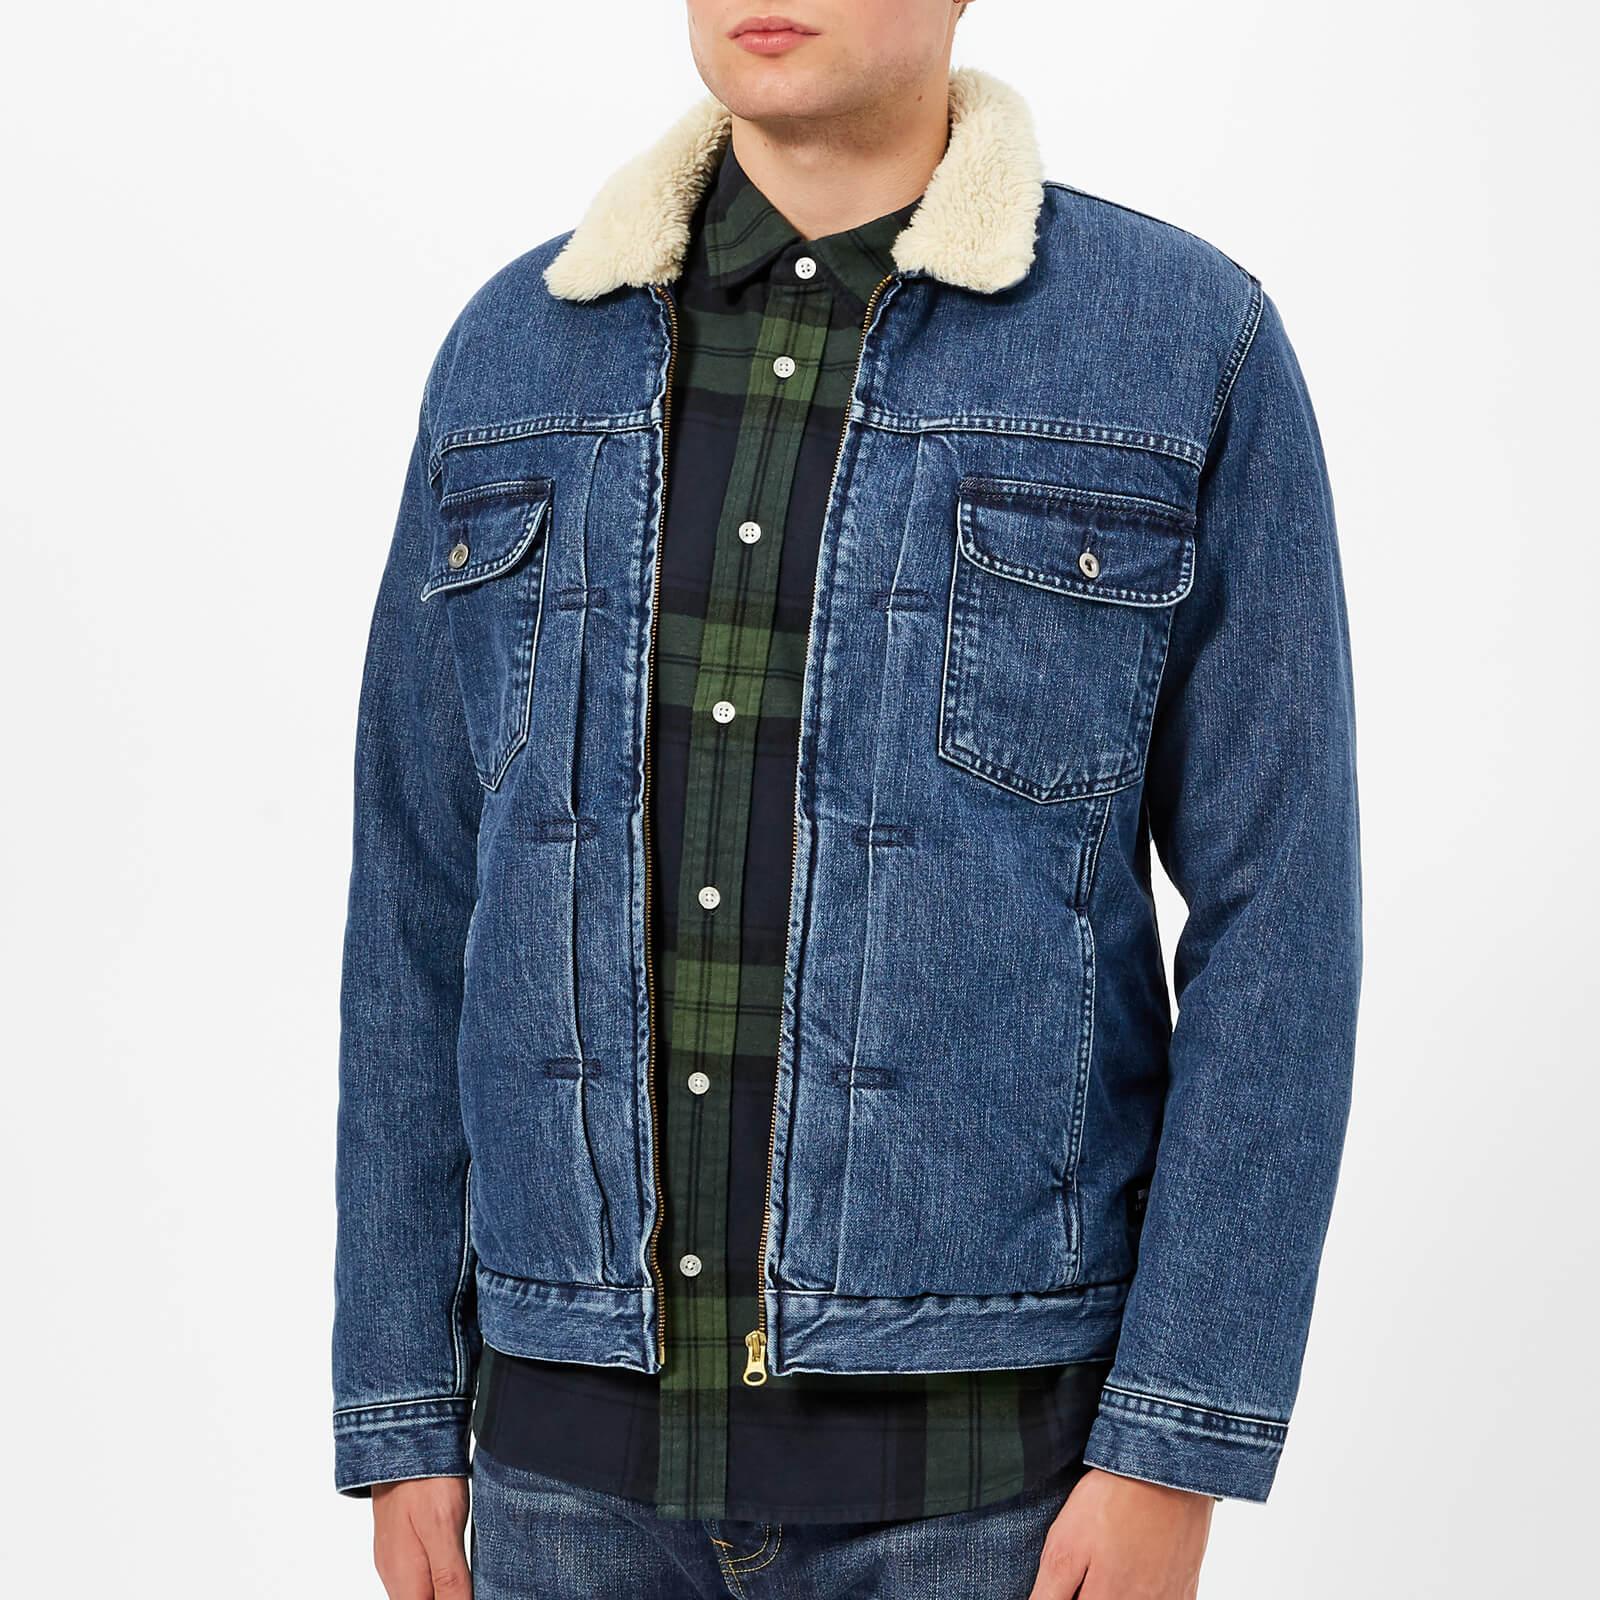 Edwin Men's Panhead Zipped Jacket - Mid Stone Wash - L - Blue